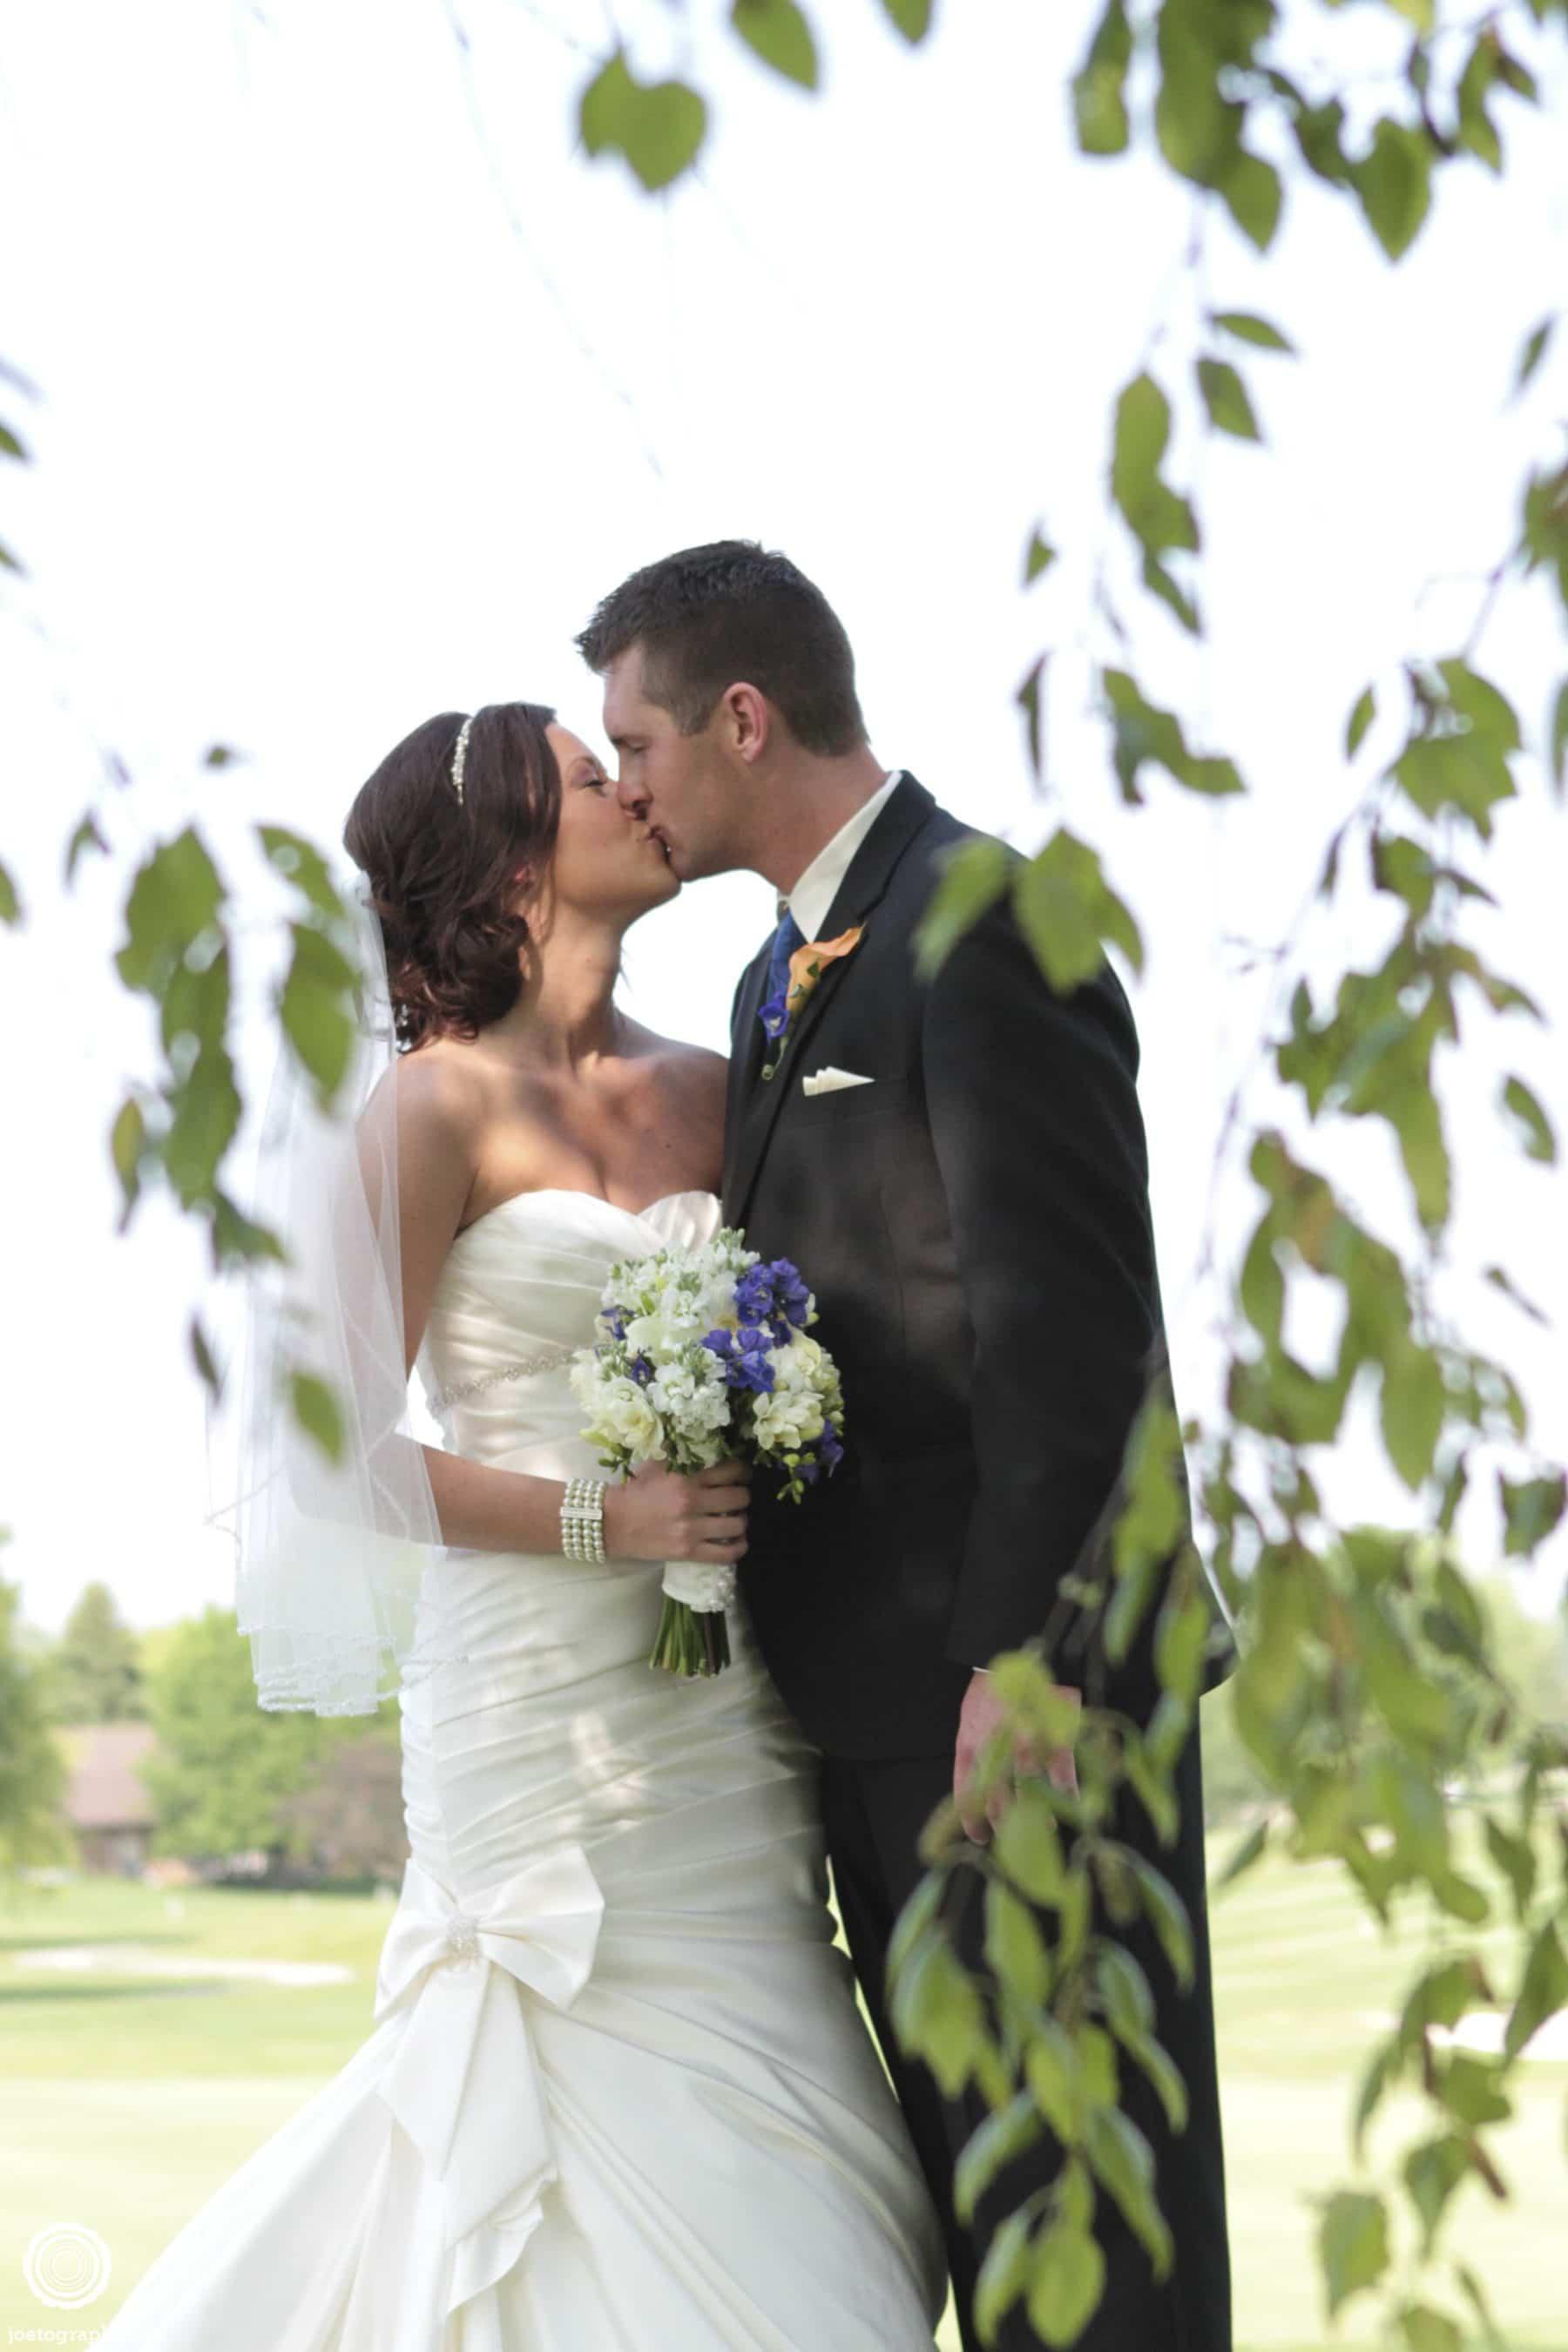 Toon-Wedding-Photographer-Greenwood-Indiana-83